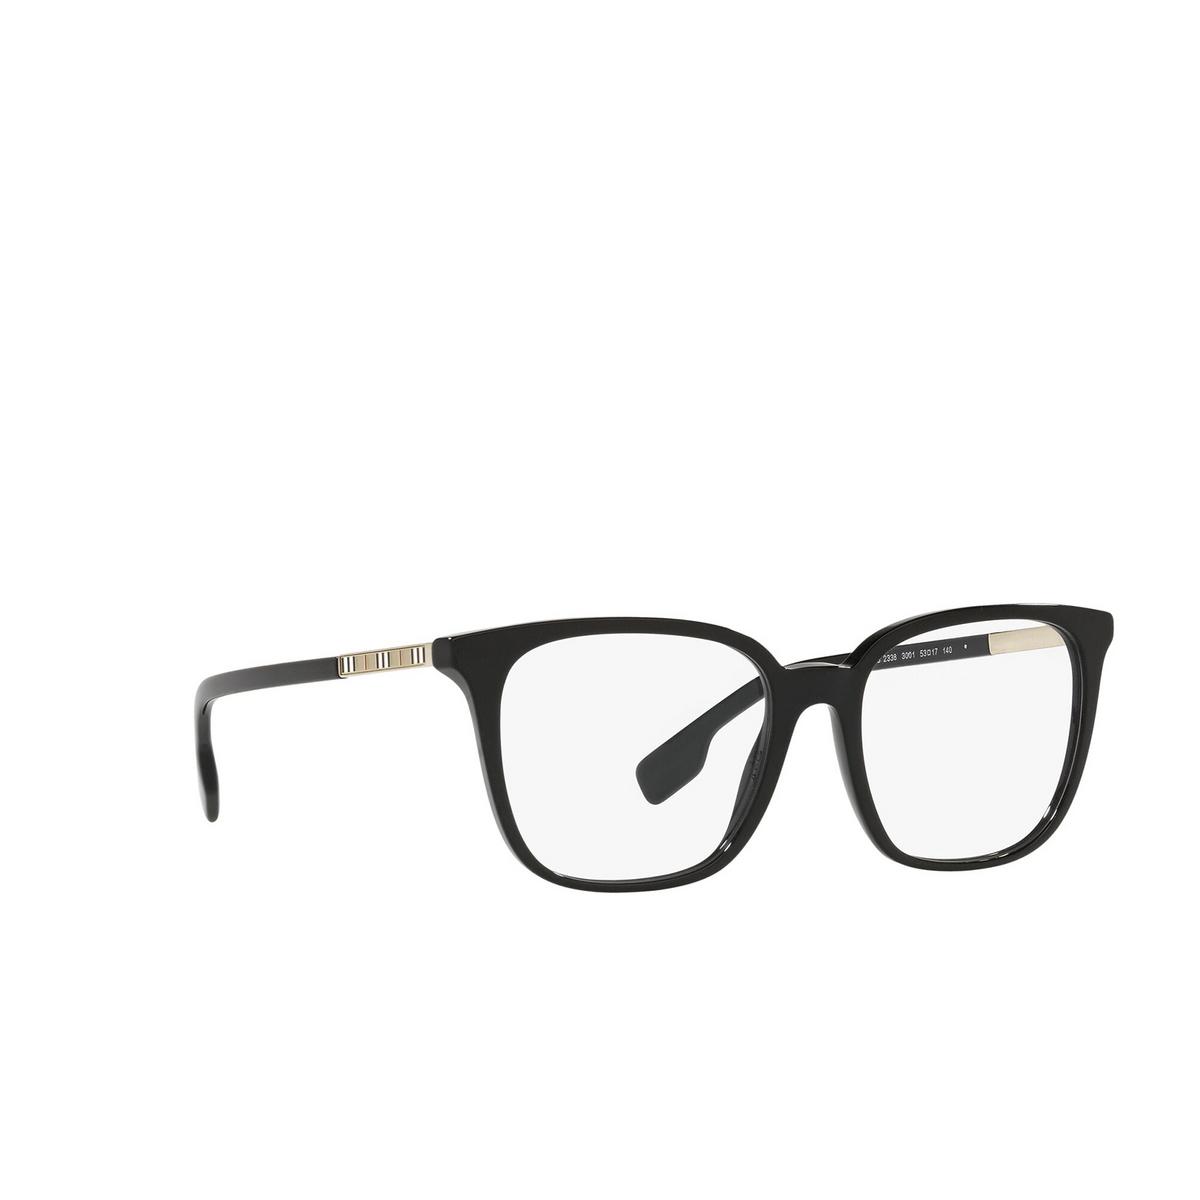 Burberry® Square Eyeglasses: Leah BE2338 color Black 3001 - three-quarters view.